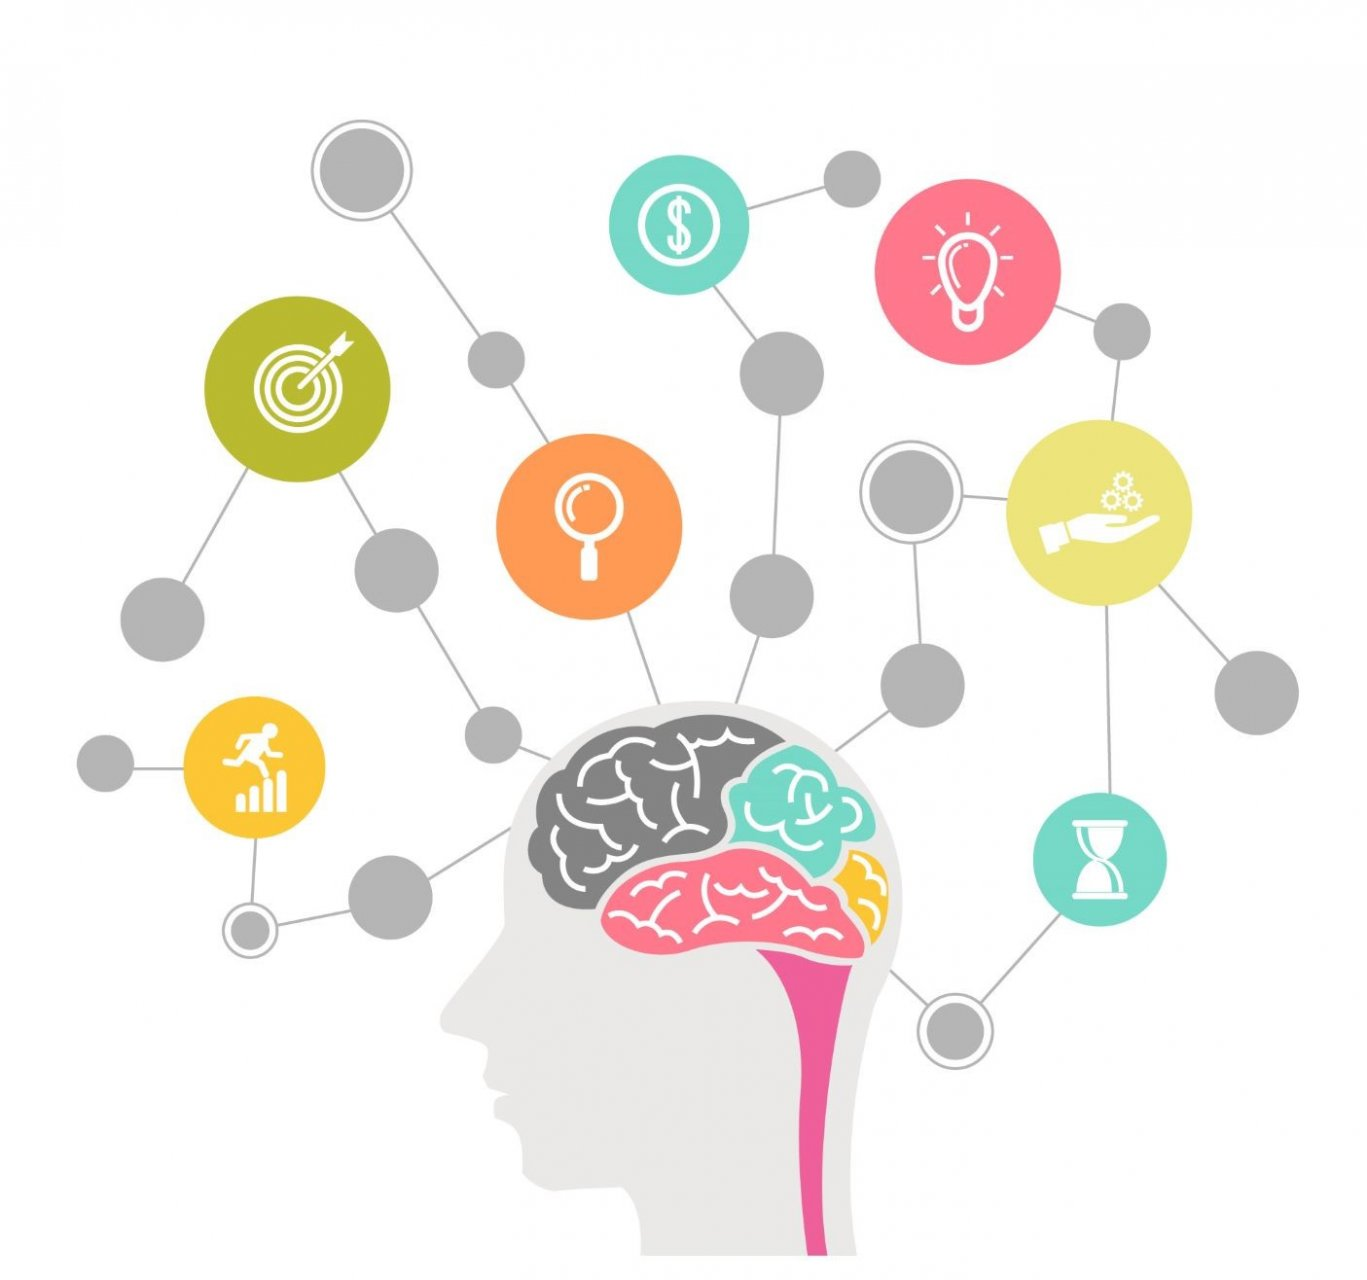 mozek-mysl-mapa